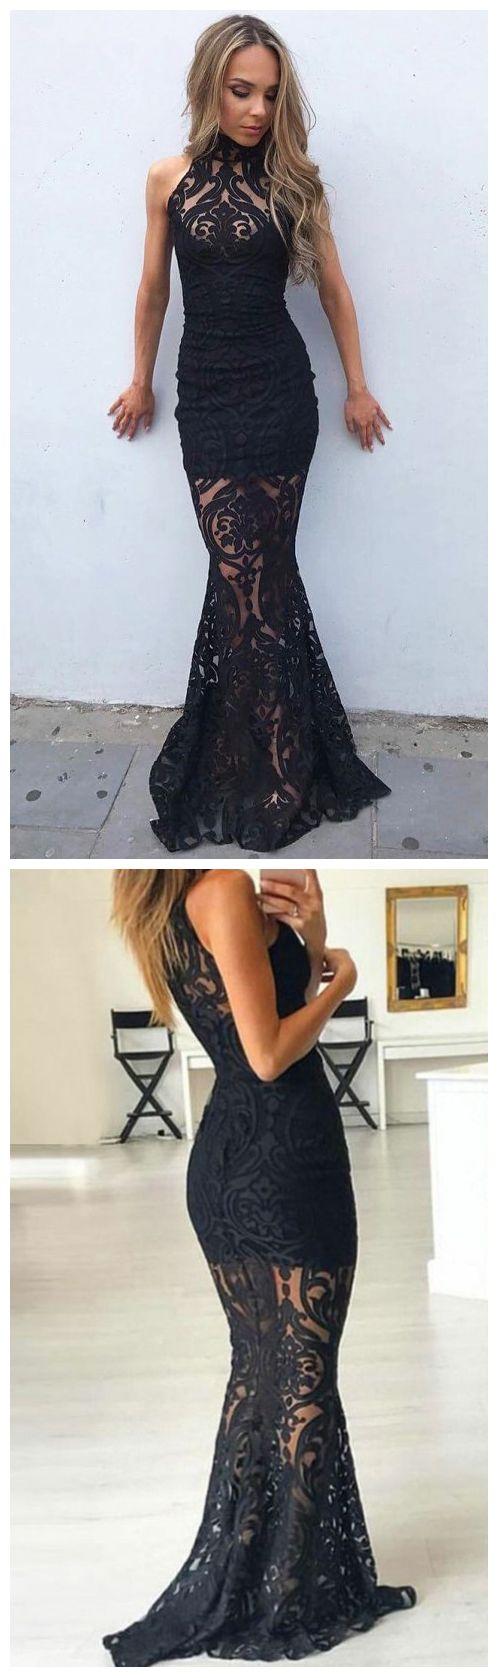 Prom Dresses ,Evening Dress, Mermaid Prom Dresses,High Neck